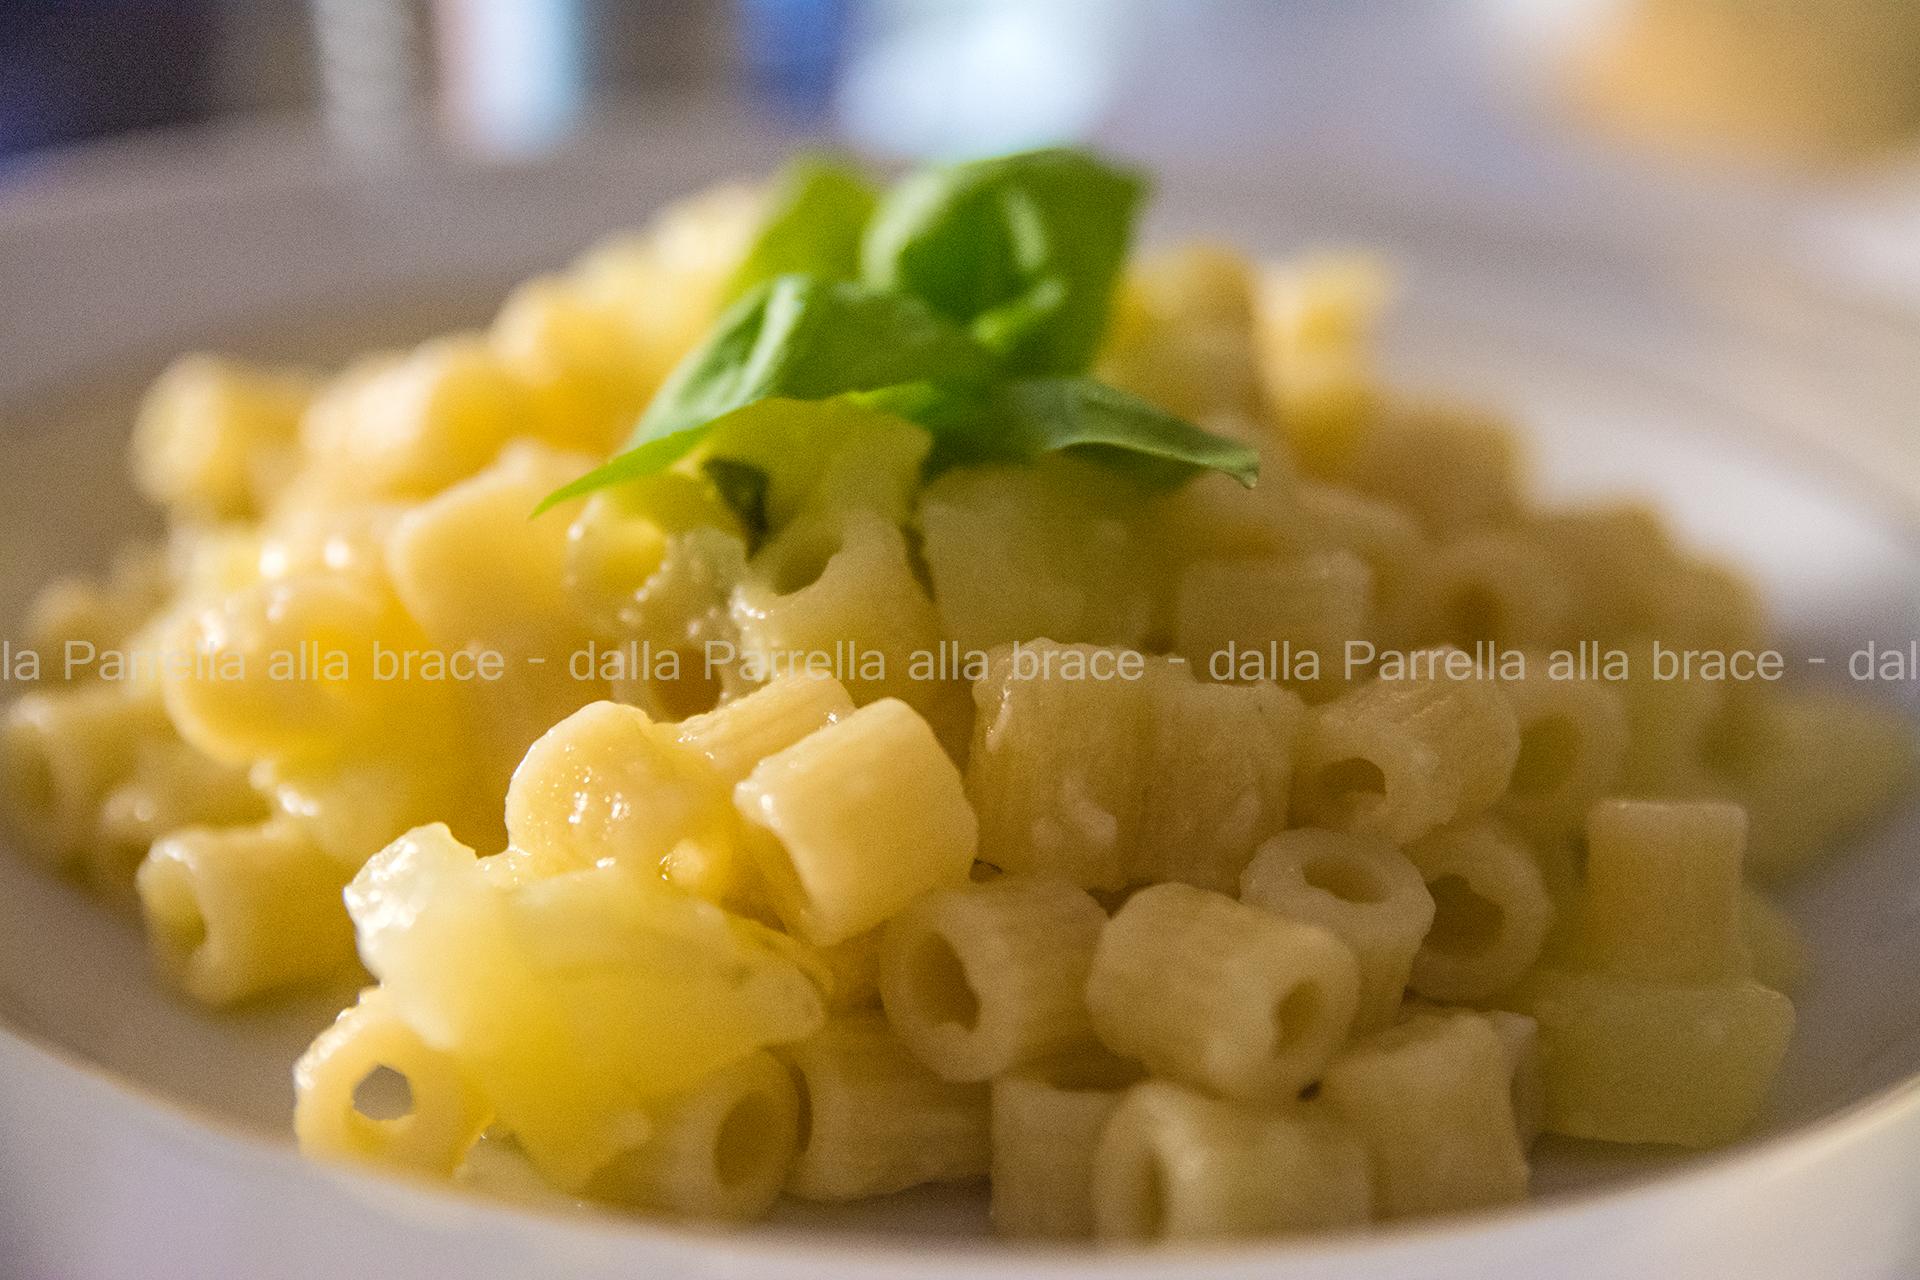 Insalata calda di pasta e patate